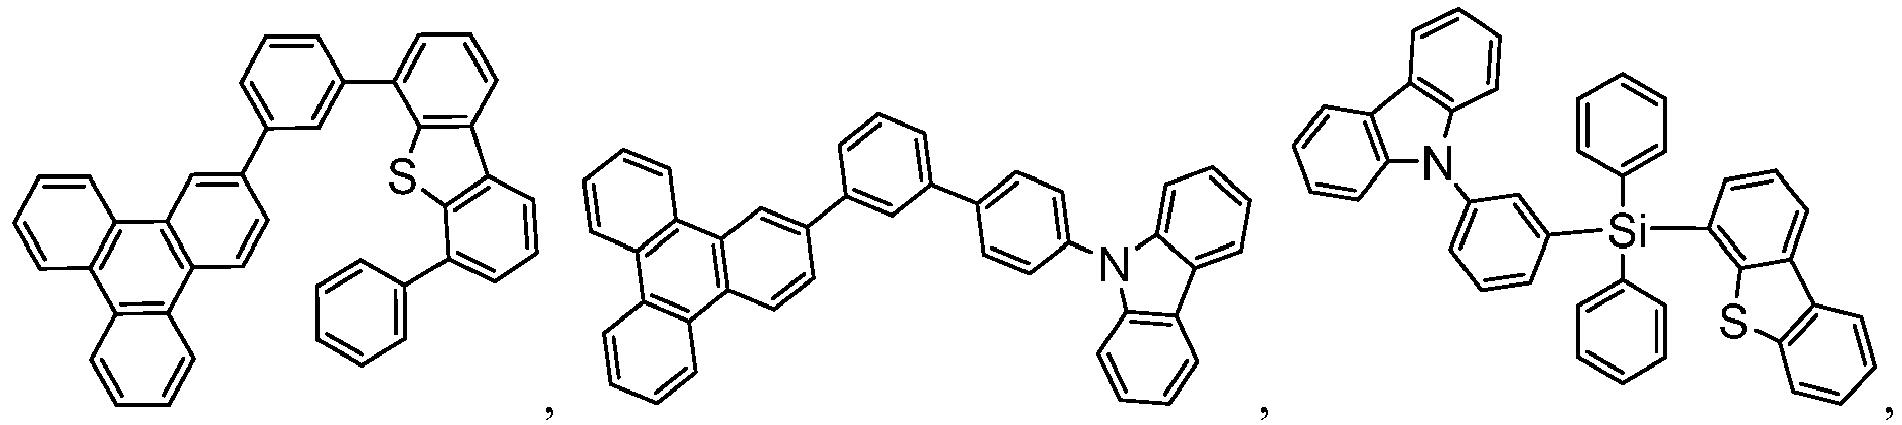 Figure imgb0988